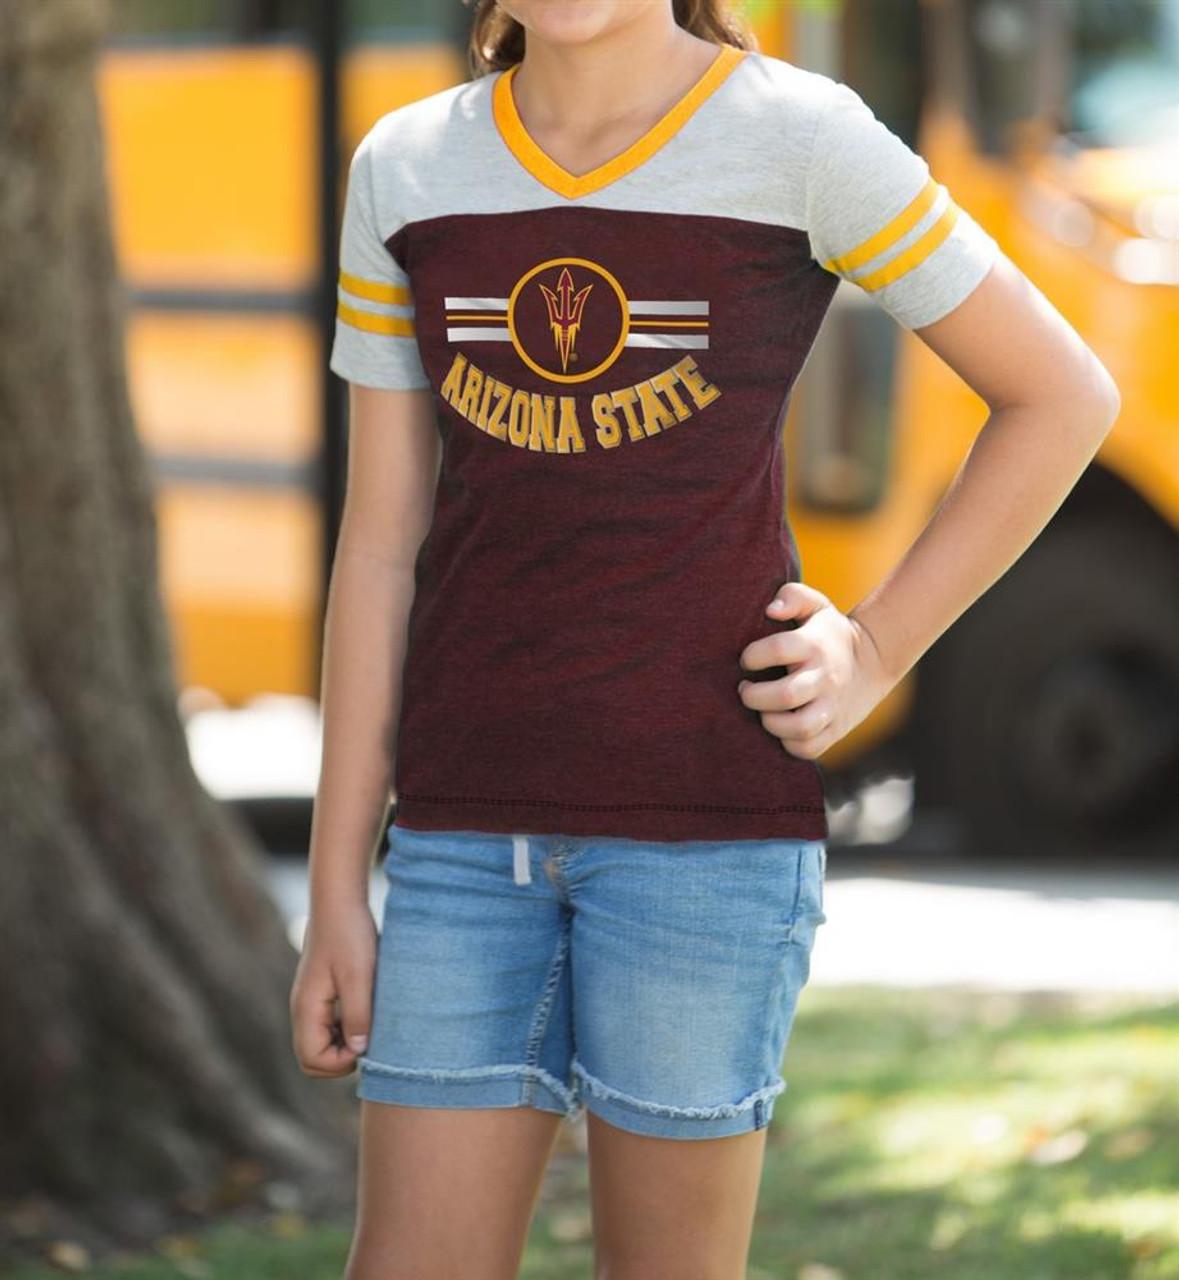 Penn State University Youth Girls Short Sleeve Pee Wee Tee